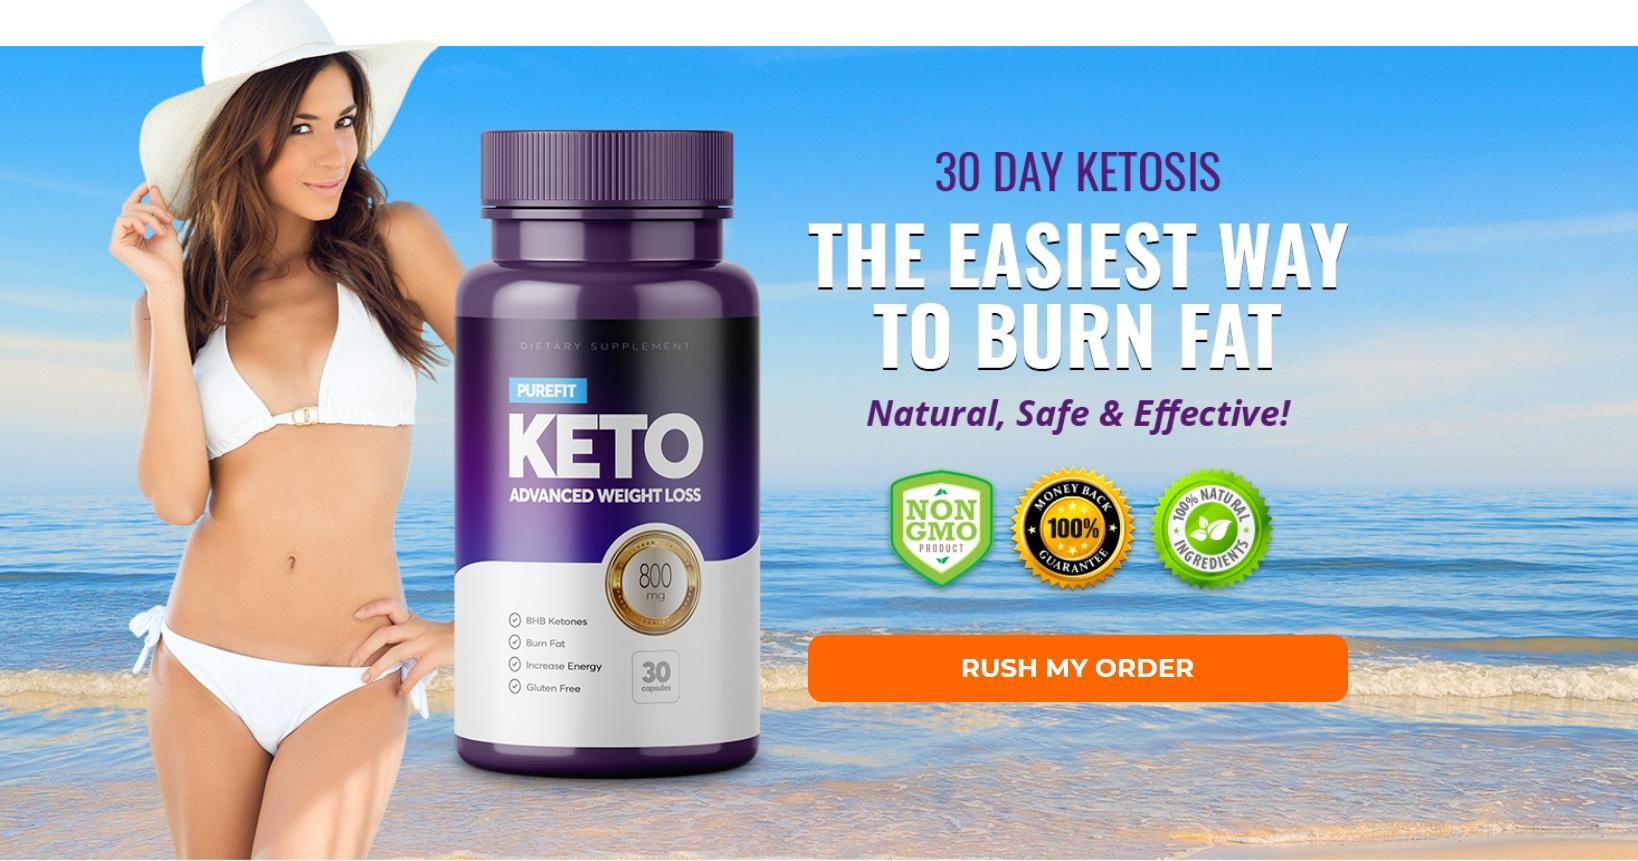 Purefit KETO - UK